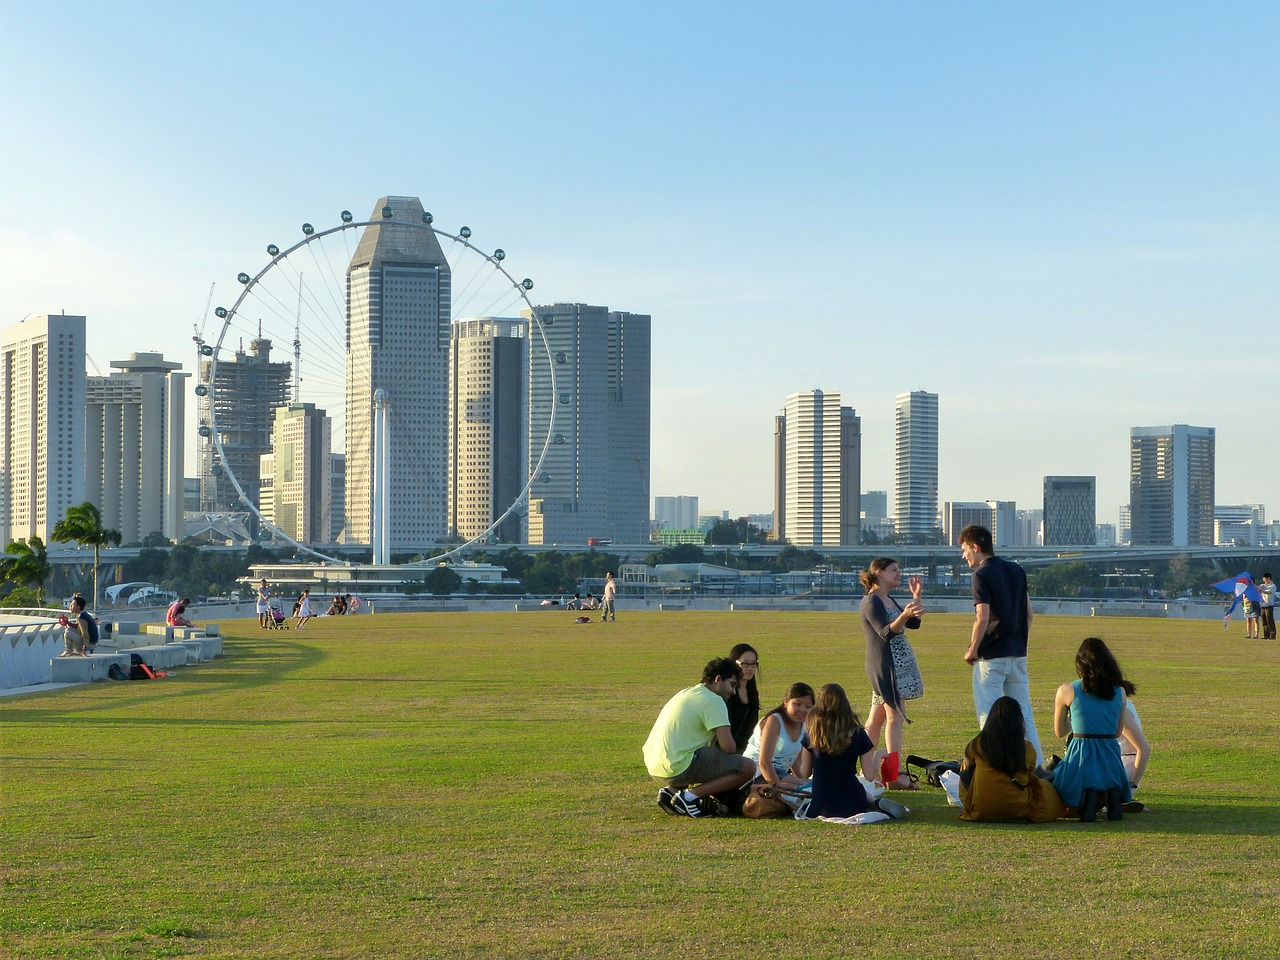 singapore-254858_1280